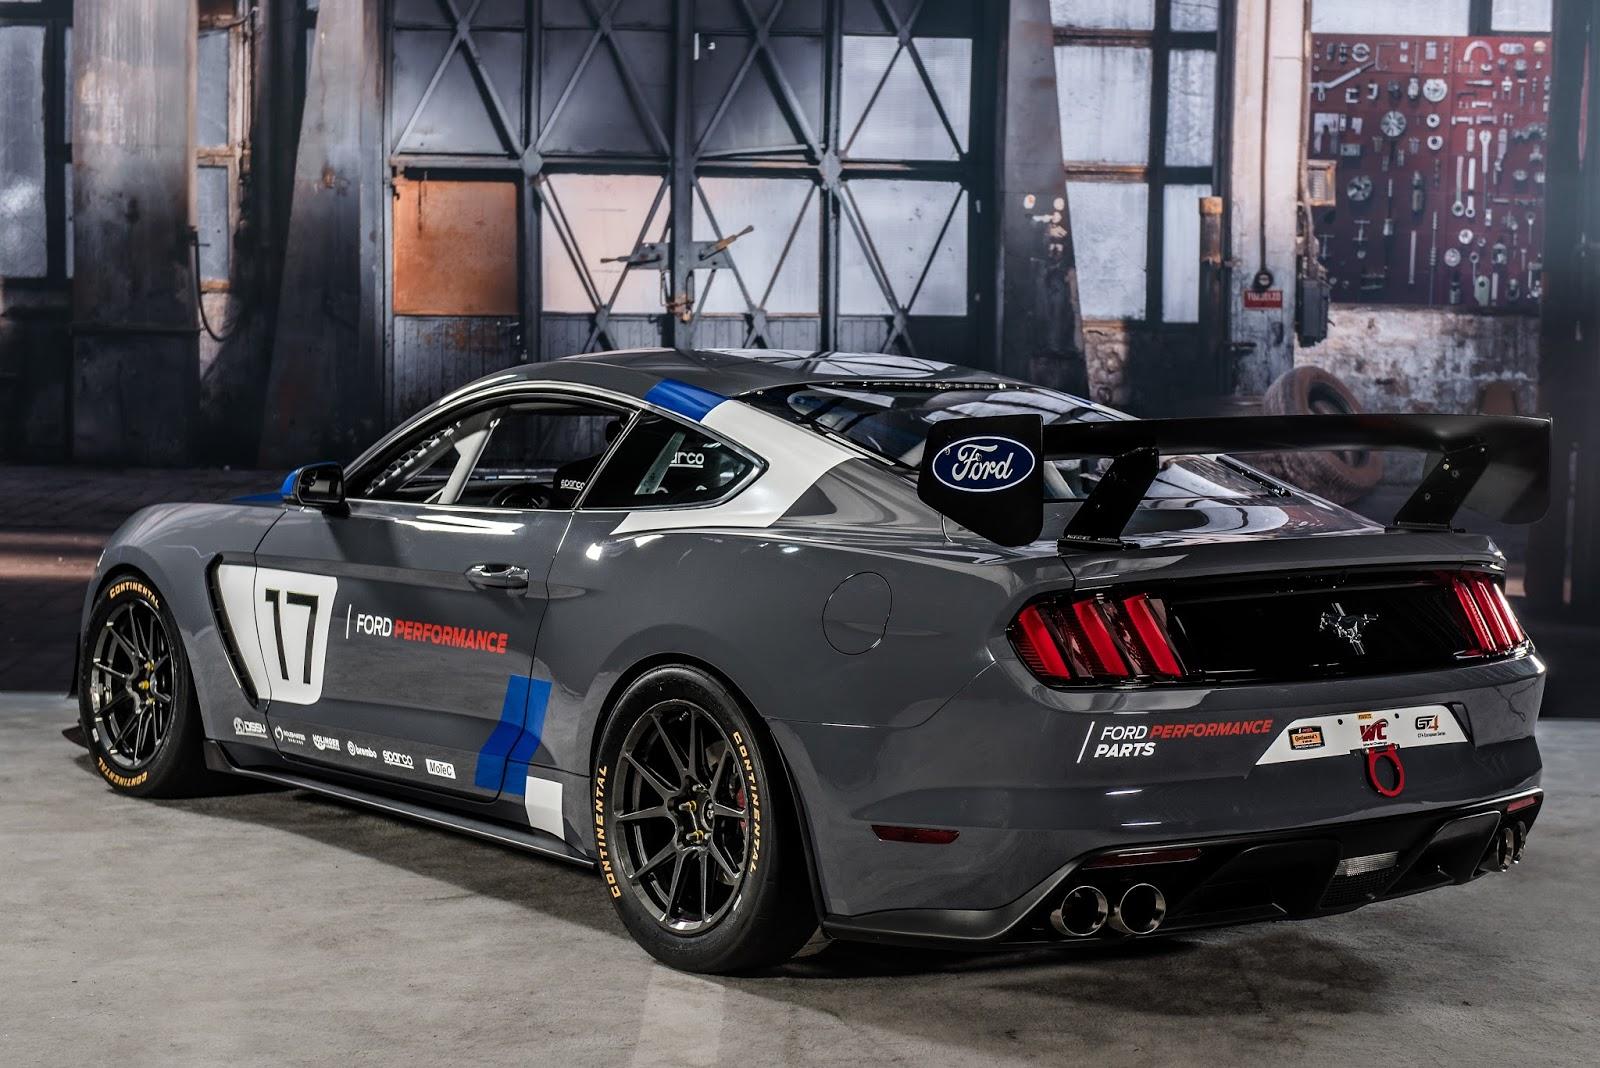 Mustang GT350R C4 Ford Performance 3 Η Ford Performance παρουσίασε την αγωνιστική Mustang GT4 στην έκθεση SEMA 2016 και ένα ...application για γρήγορους γύρους στην πίστα! App, autoshow, Ford, Ford Mustang, Ford Mustang GT4, Ford Performance, SEMA, videos, Τεχνολογία